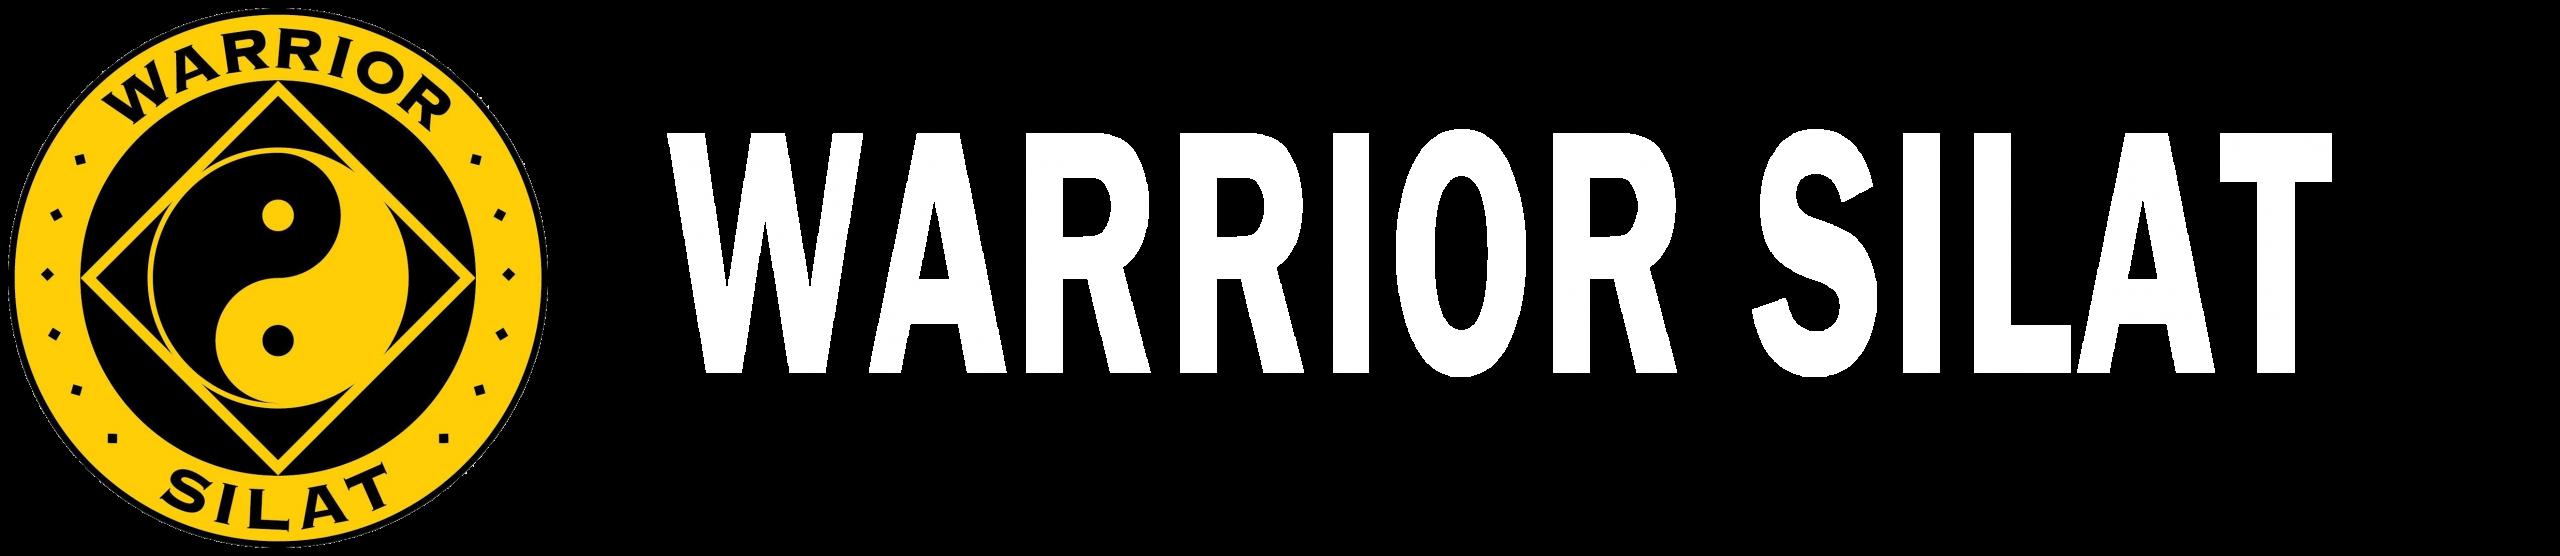 Warrior Silat